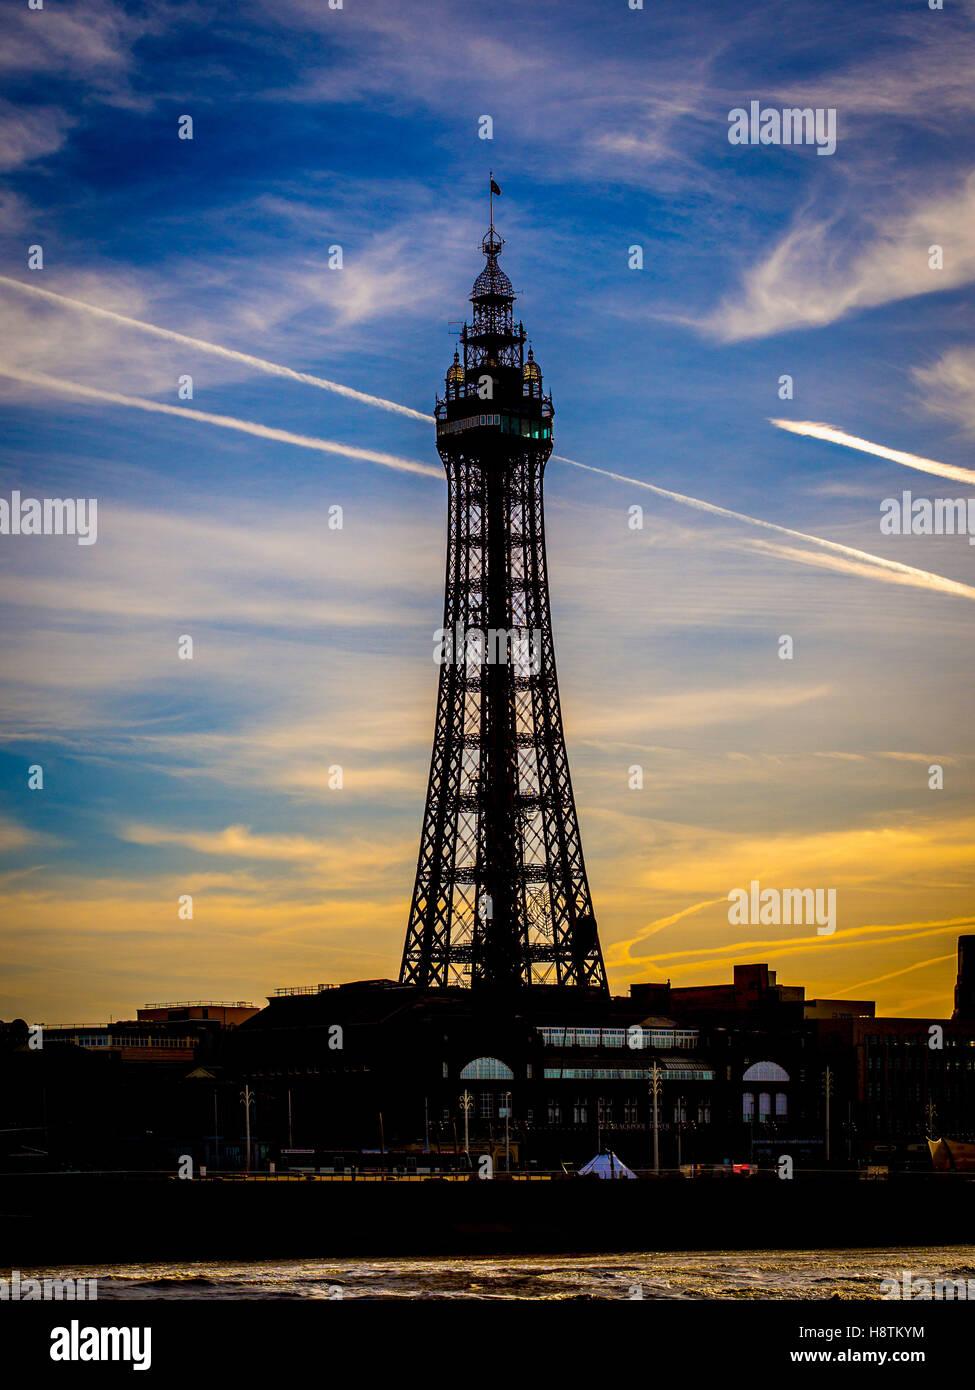 Blackpool Tower Silhouette gegen Morgensonne, Blackpool, Lancashire, UK. Stockbild